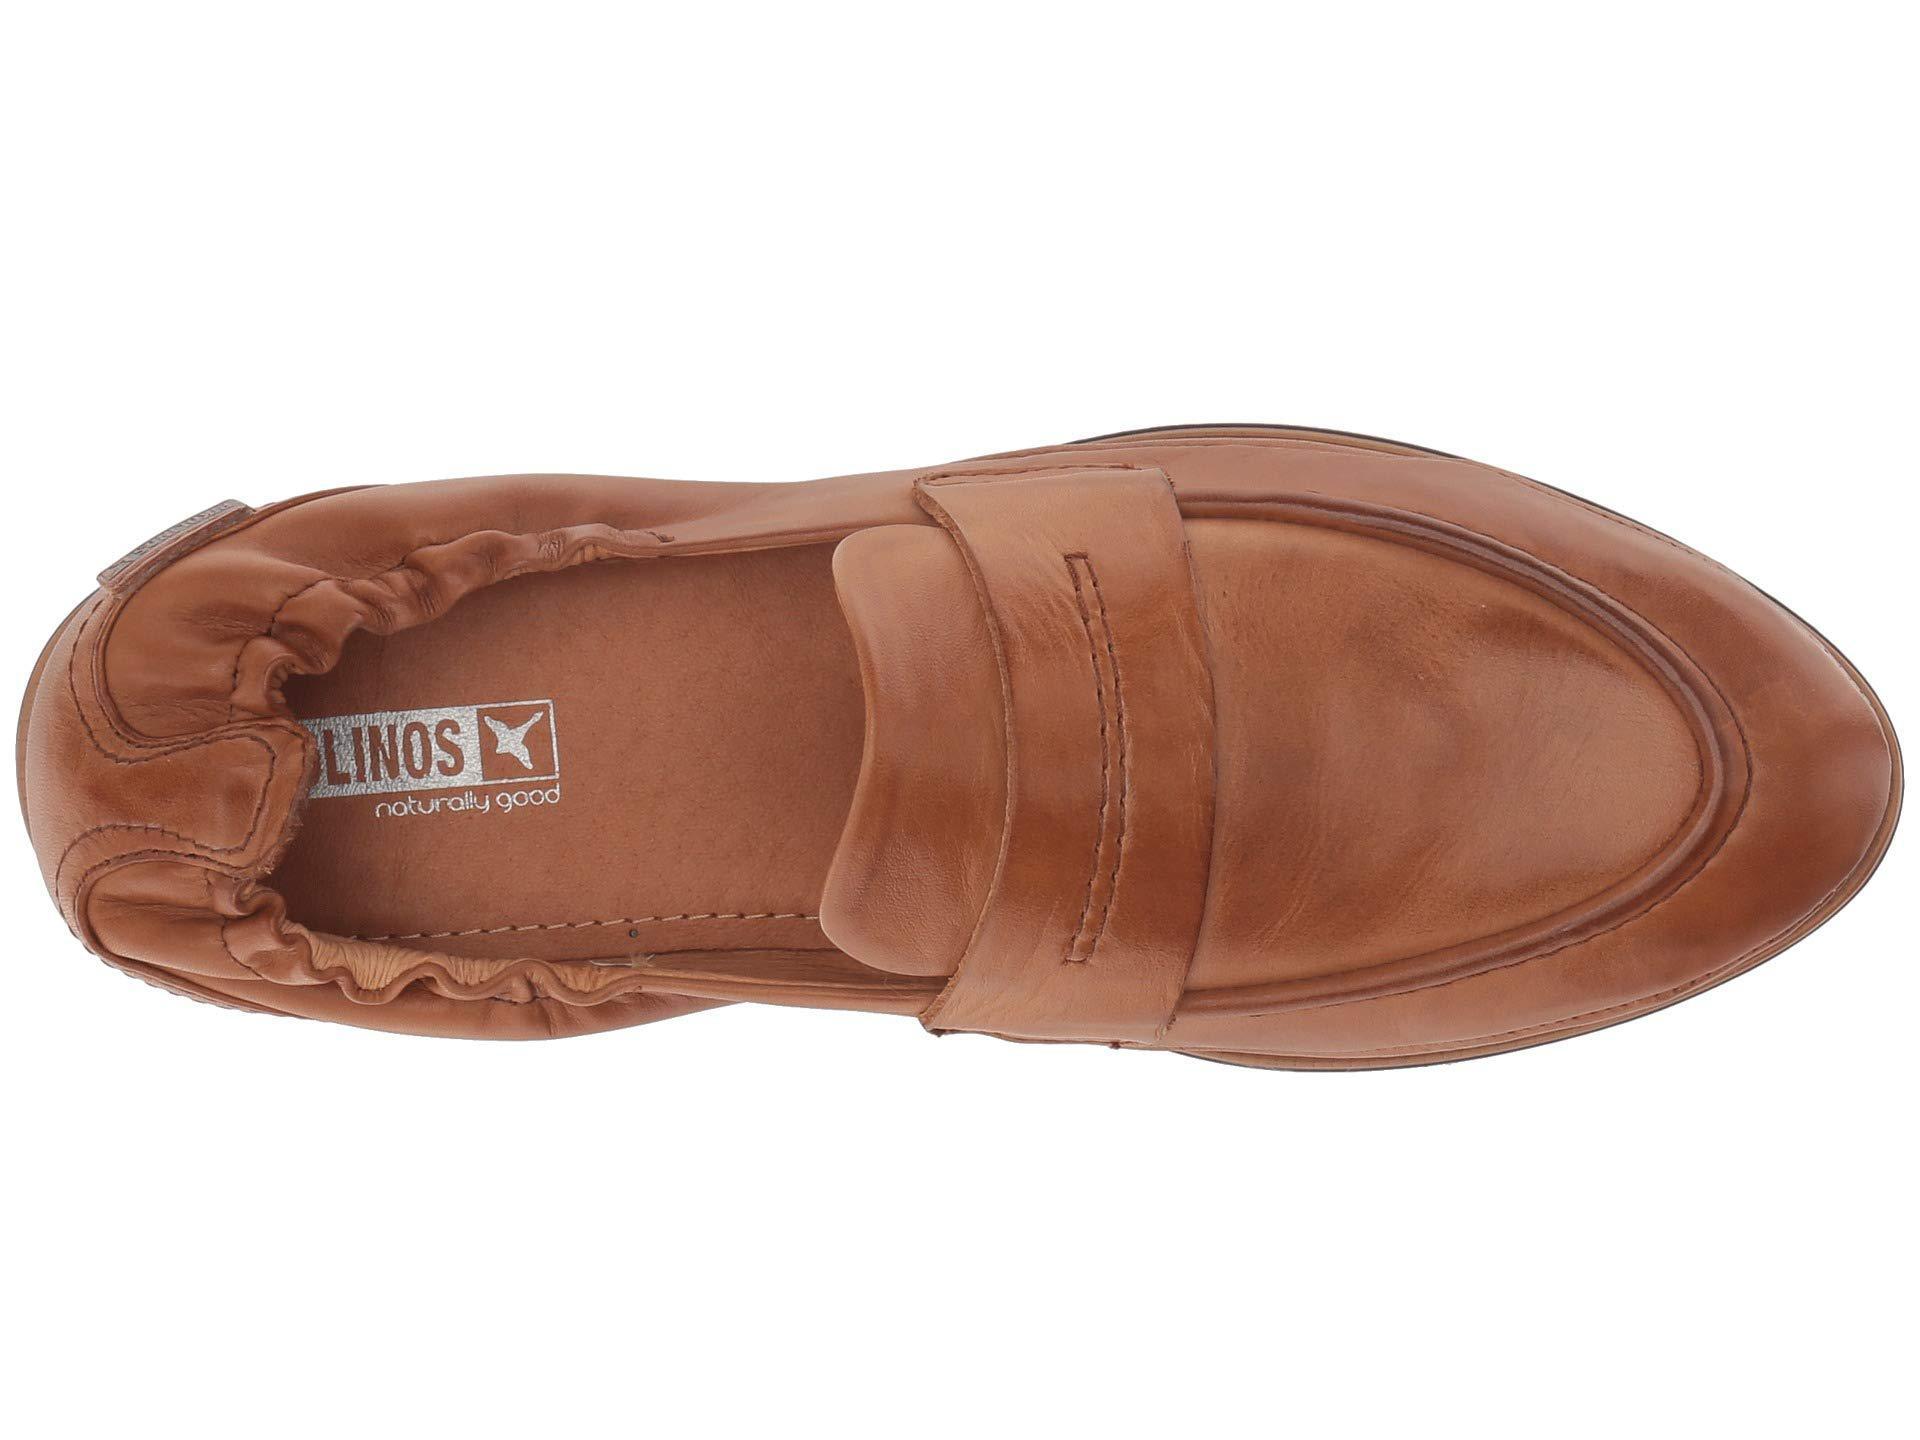 6bd57aef290 Lyst - Pikolinos Santorini W3v-3720 (brandy) Women s Shoes in Brown